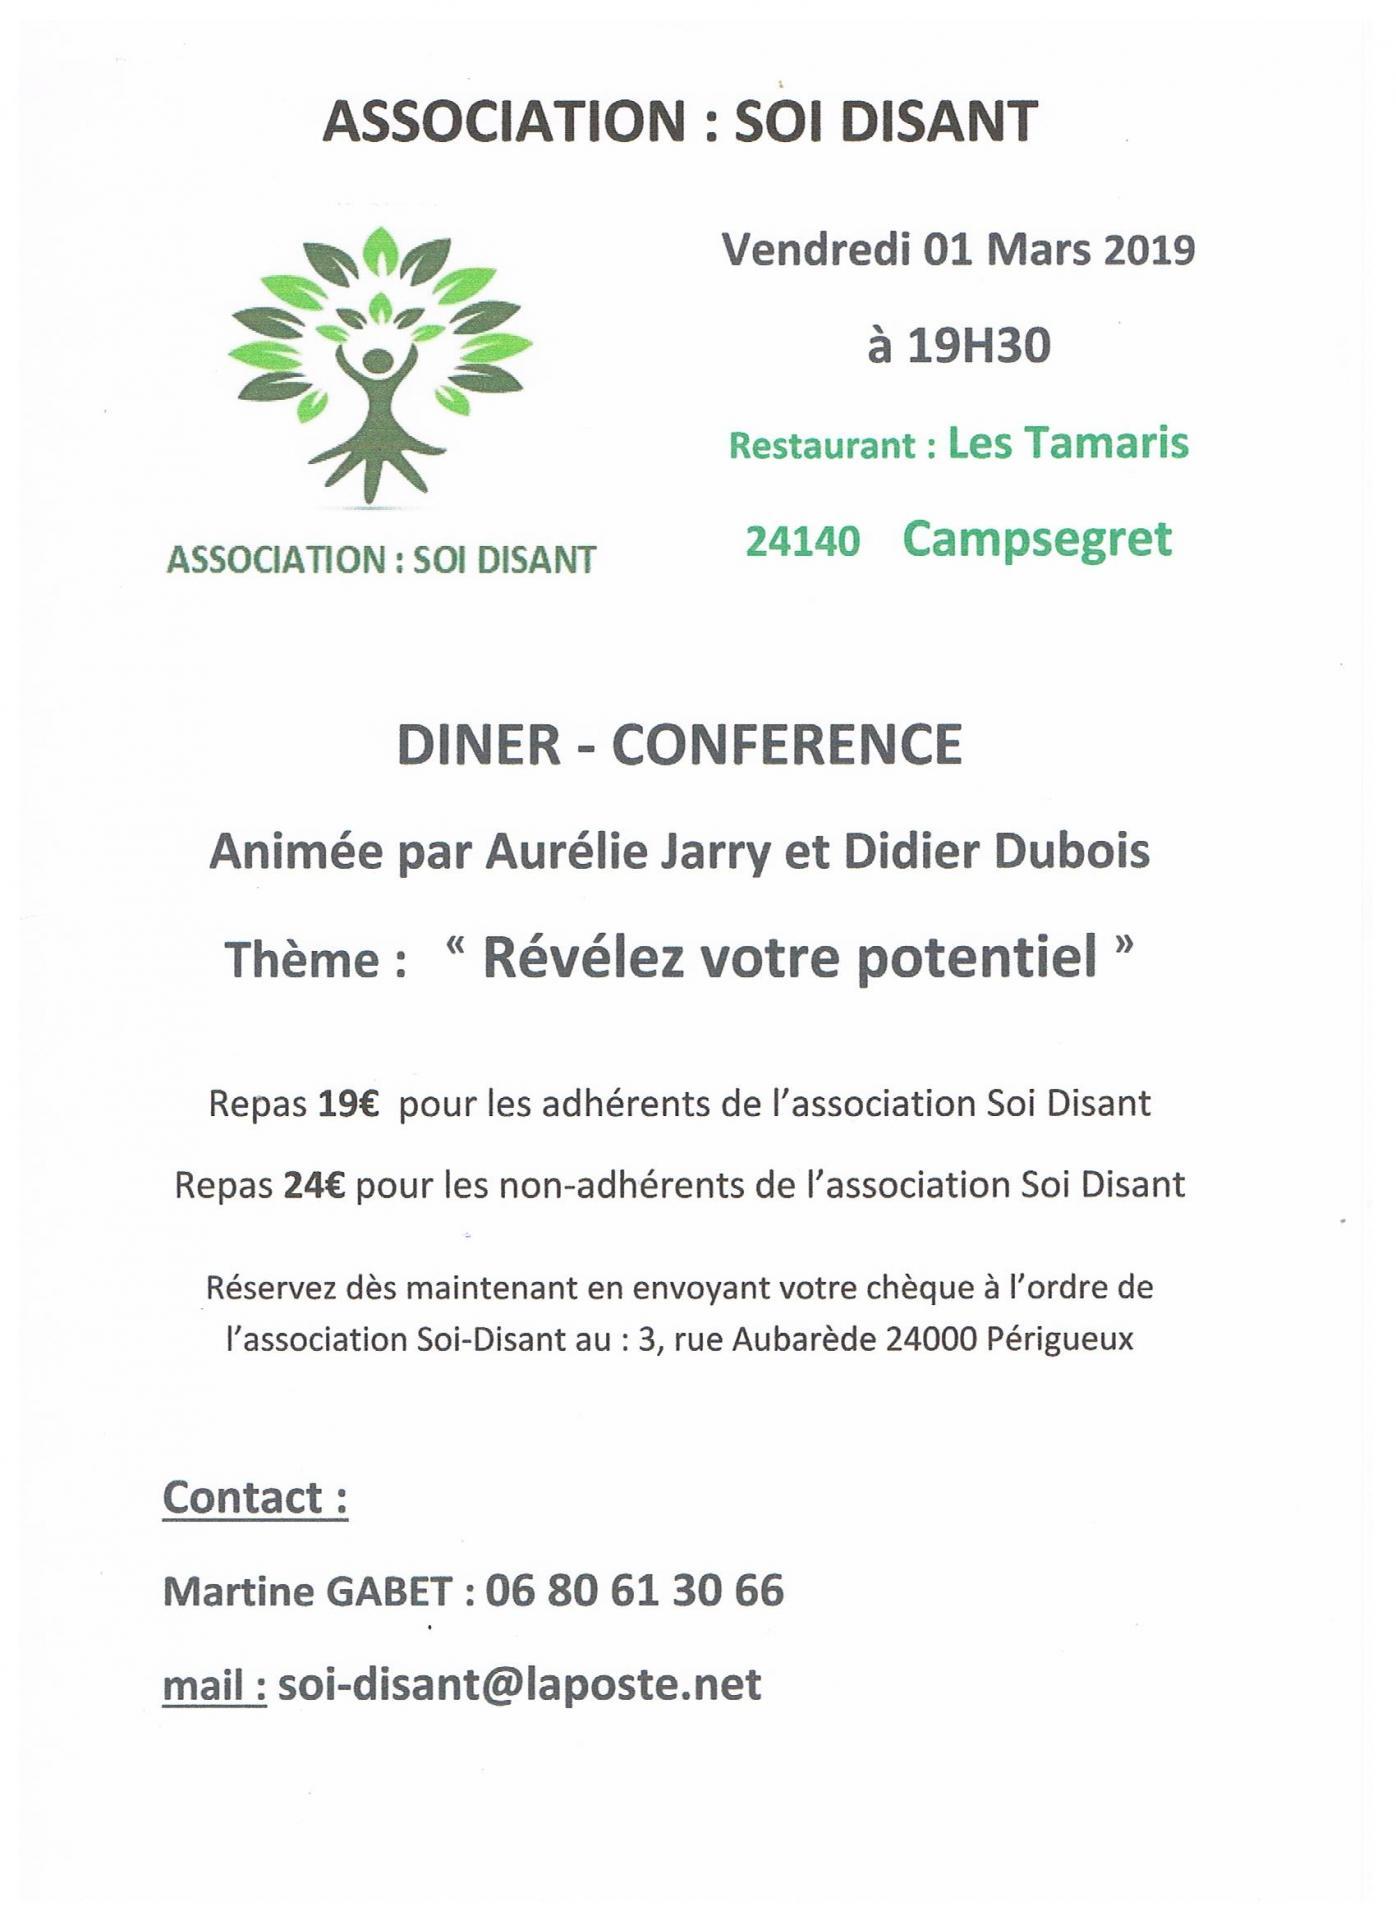 Diner conference 01 mars 2019 association soi disant pdf